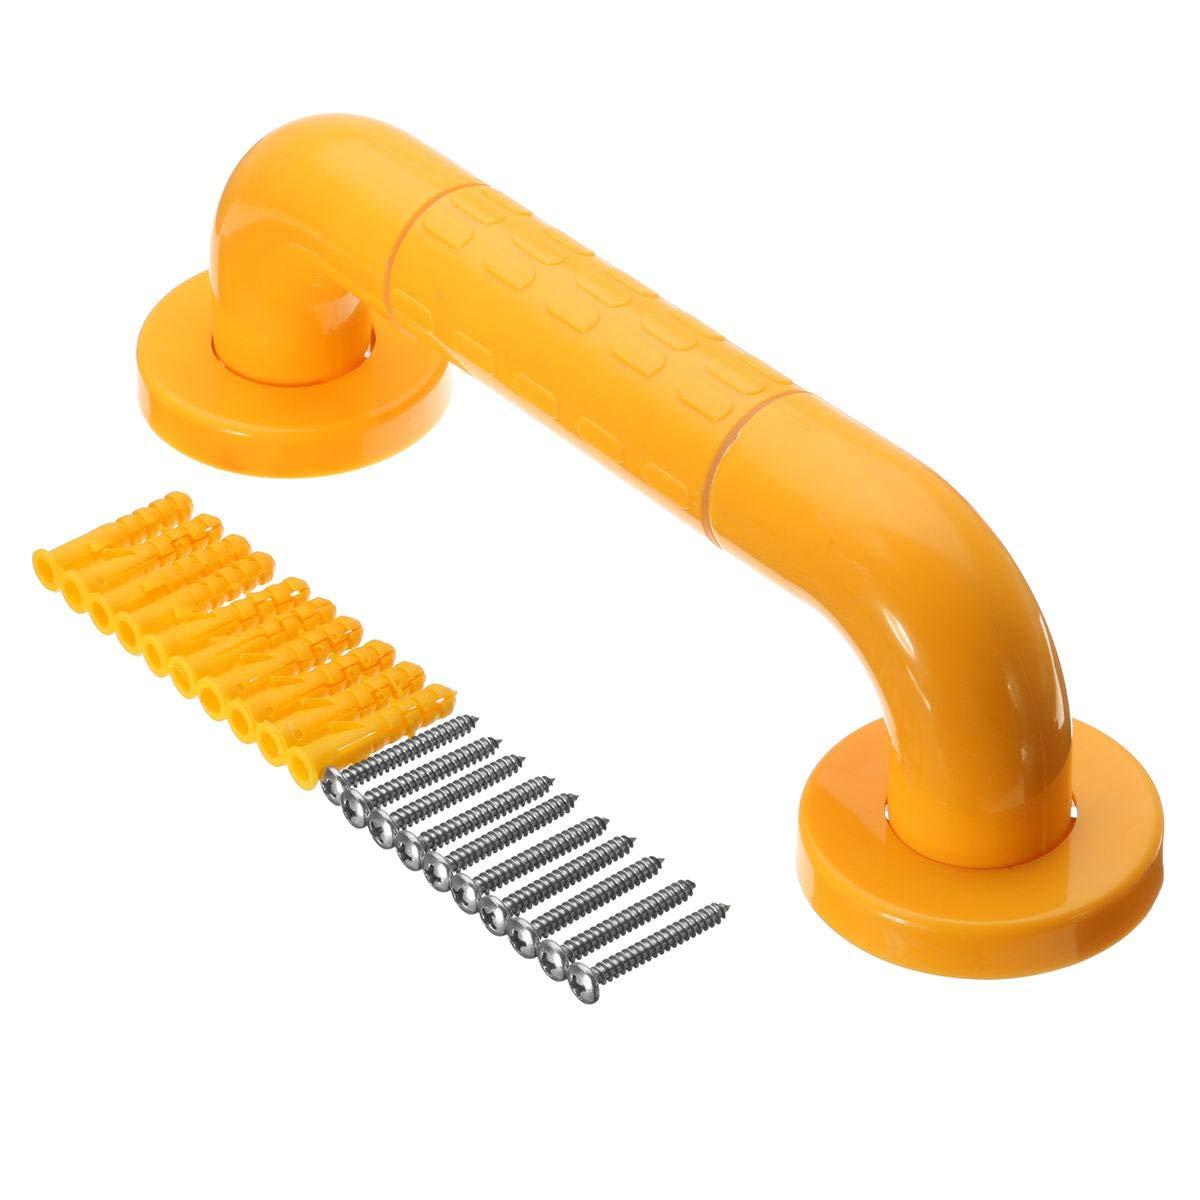 Grab Handles 30cm Bathroom Shower Toilet Safety Handrail Elderly Wall Handrail Grip Staight Handle Stainless Steel Bathroom Safety Grab Bar